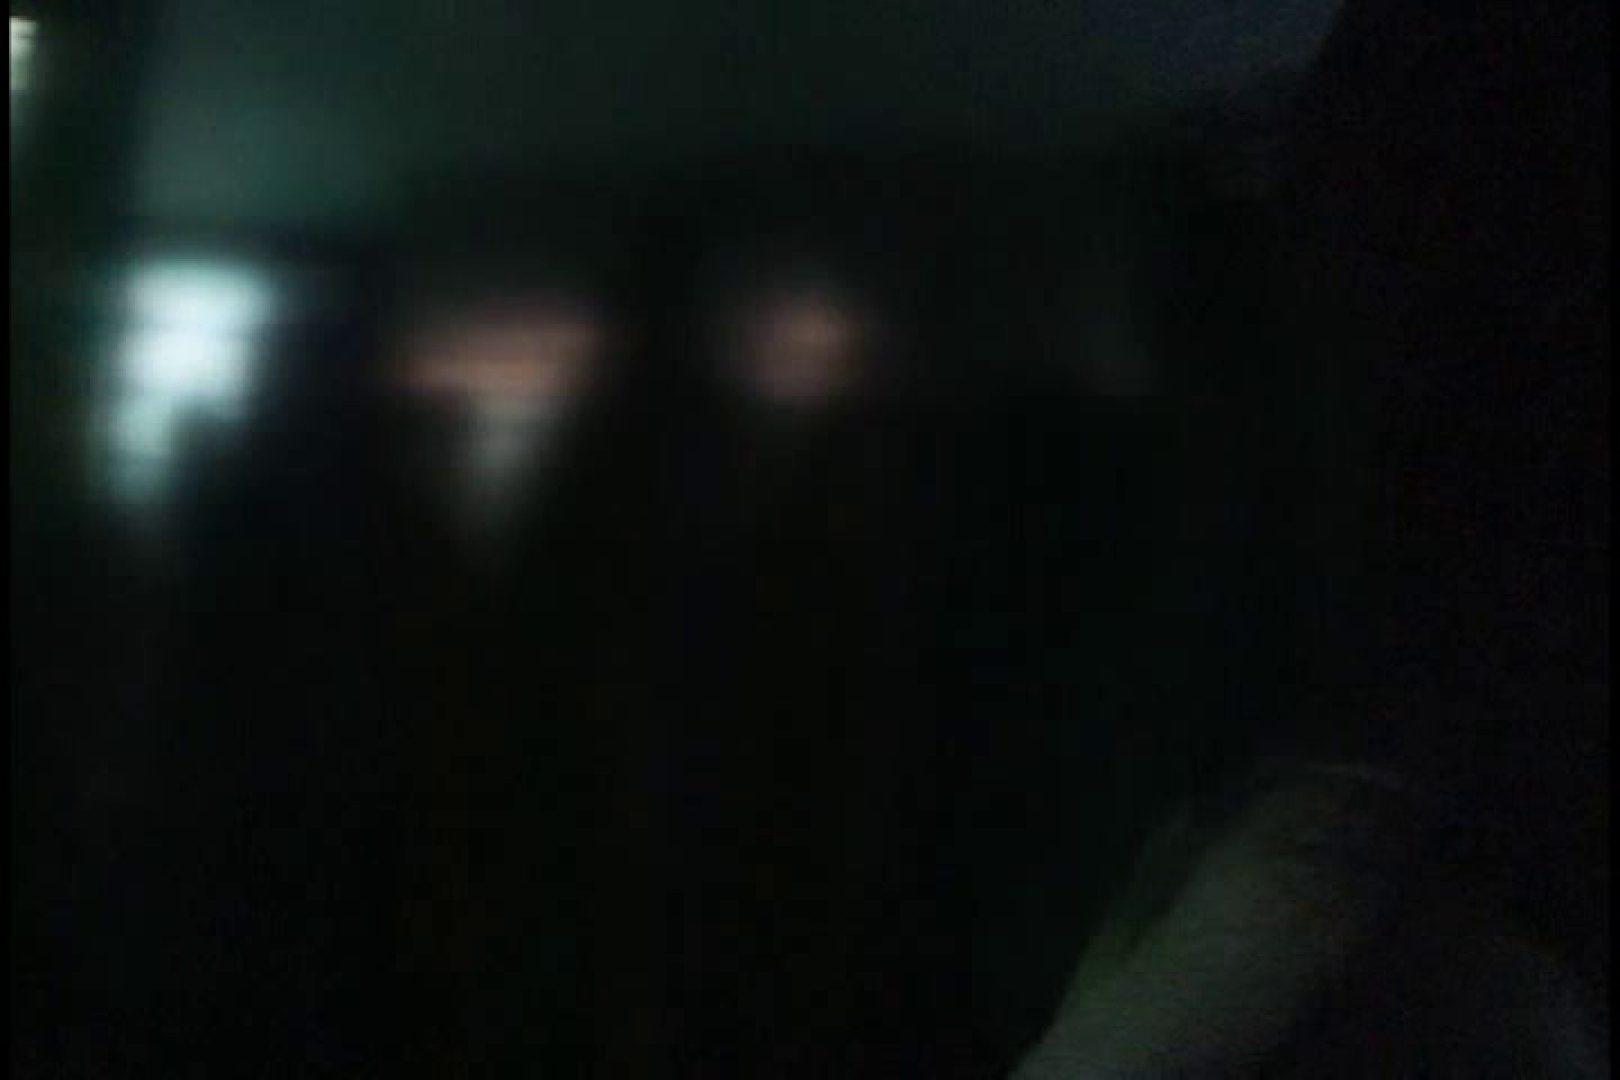 JDハンター全国ツアー vol.025 前編 Hな女子大生 戯れ無修正画像 89pic 35